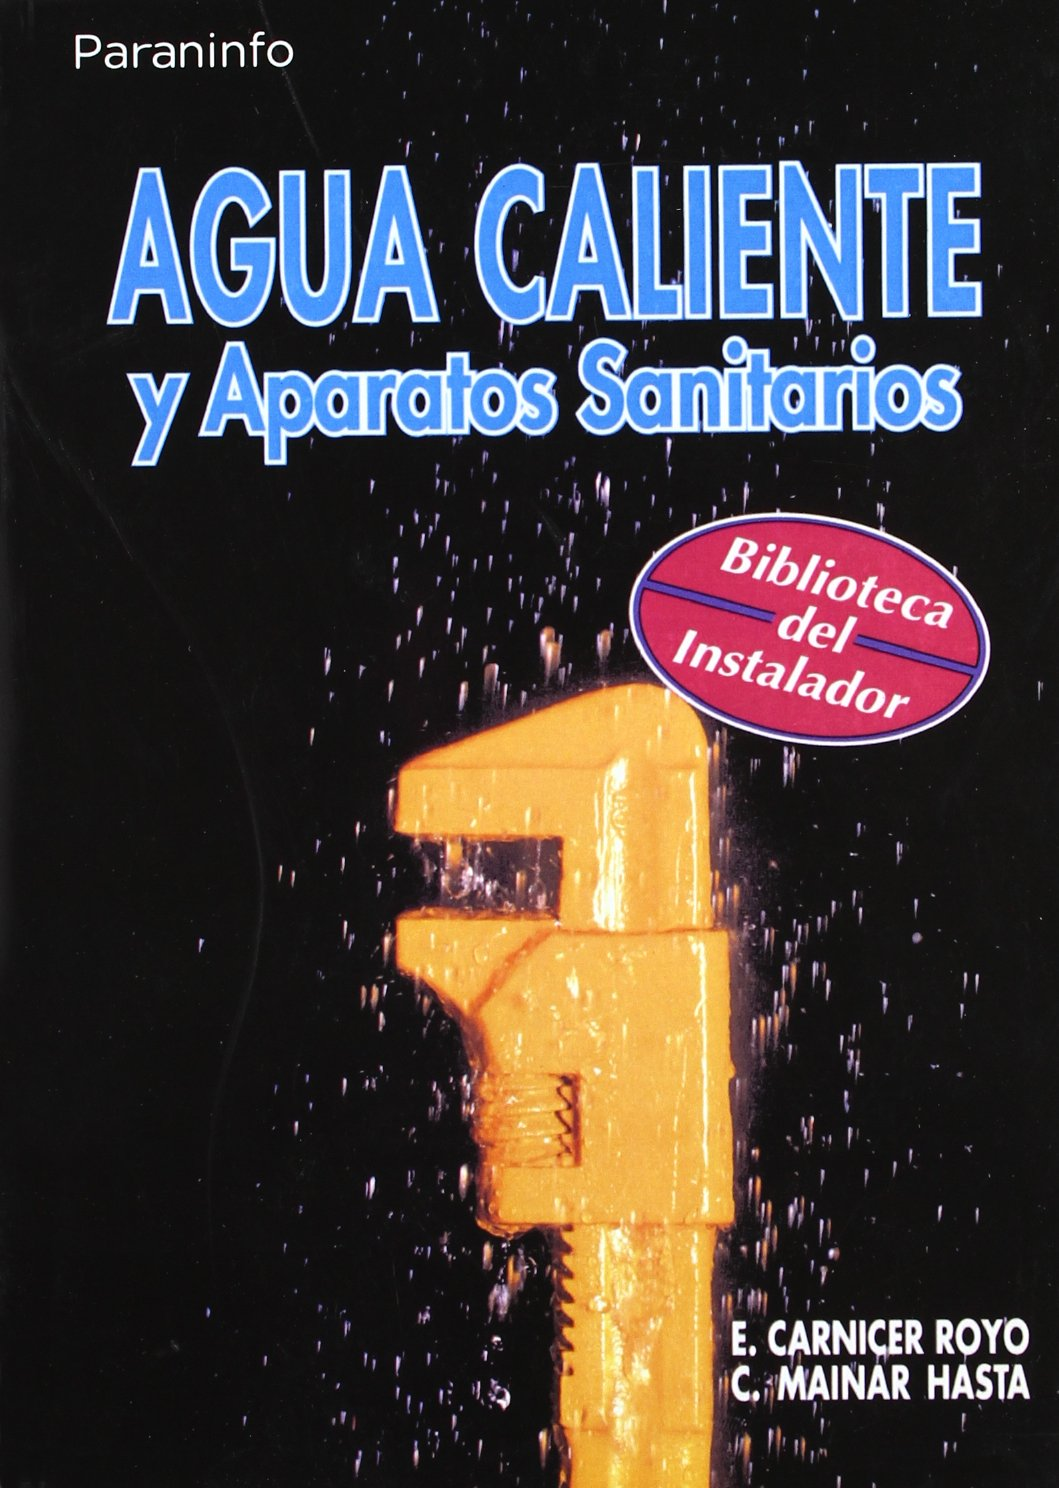 Agua Caliente y Aparatos Sanitarios (Spanish Edition): Enrique Carnicer Royo, Concepcion Mainar Hasta: 9788428321693: Amazon.com: Books